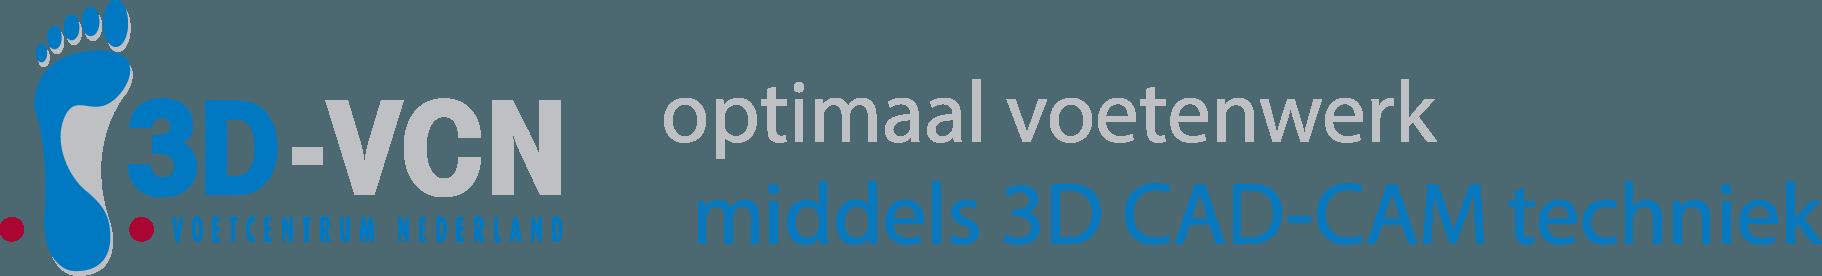 3D-VCN Logo